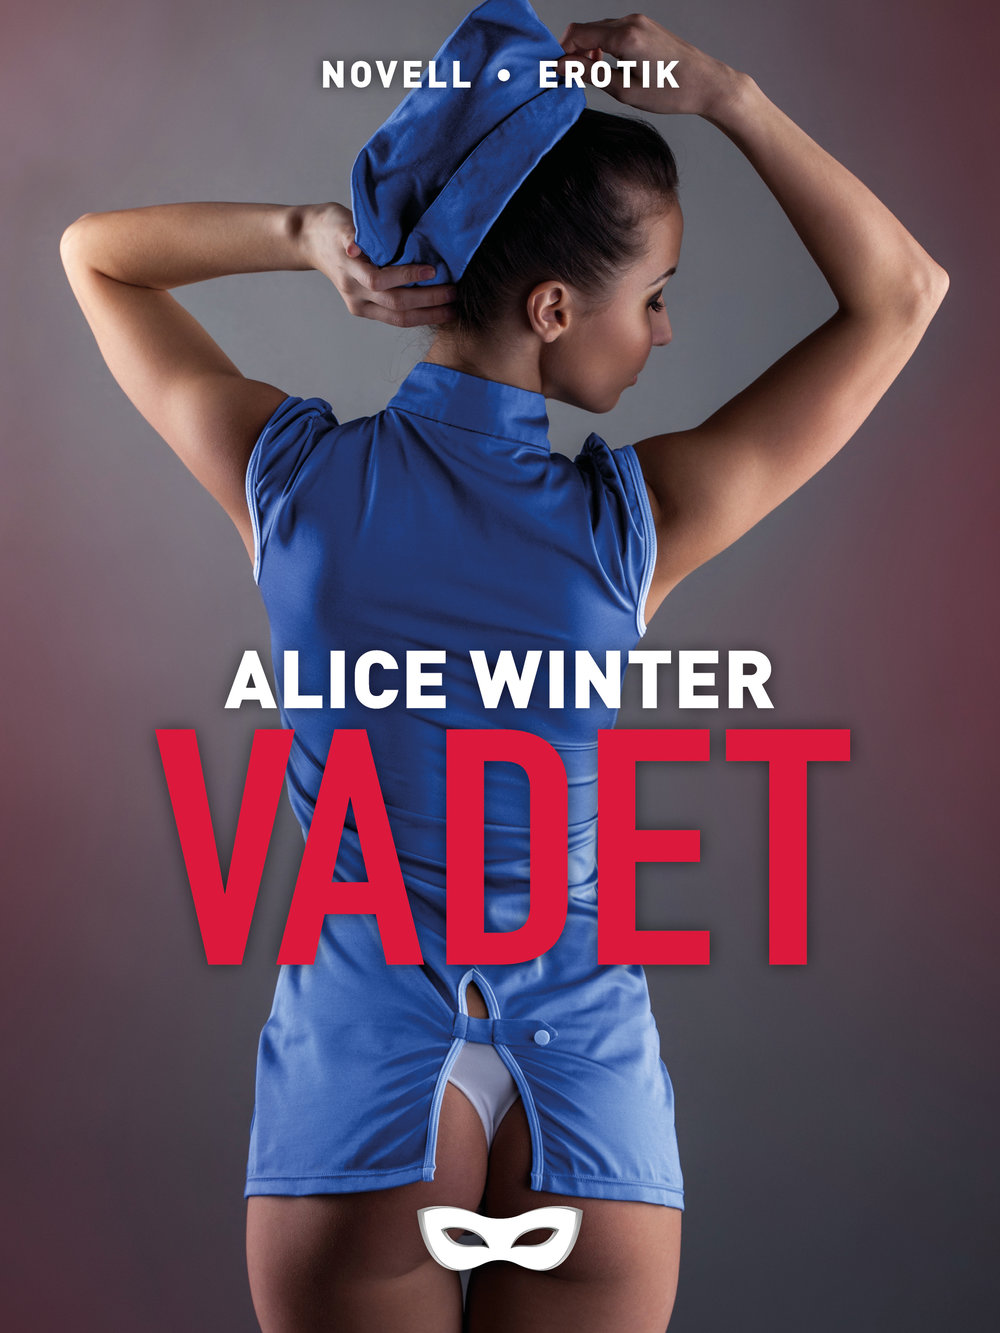 VAD-n_Vadet_Alive Winter.jpg